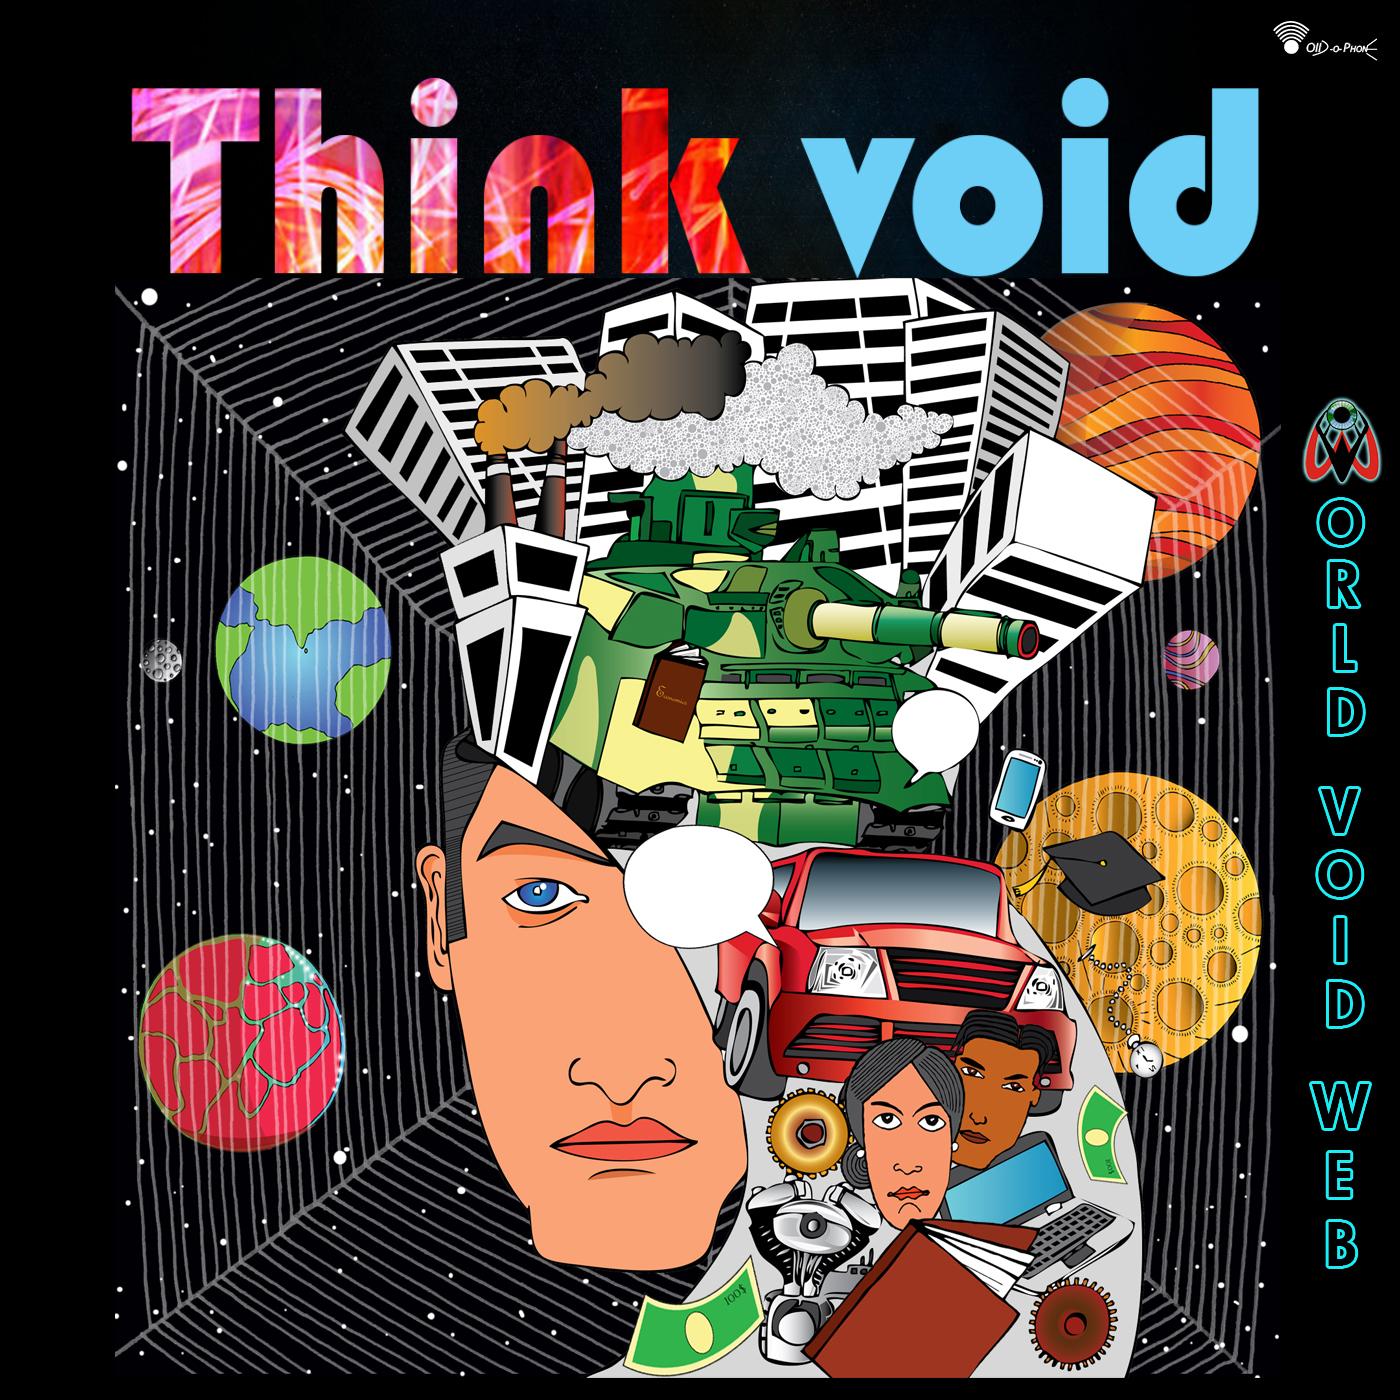 World Void Web Set to Release Think Void 9/9